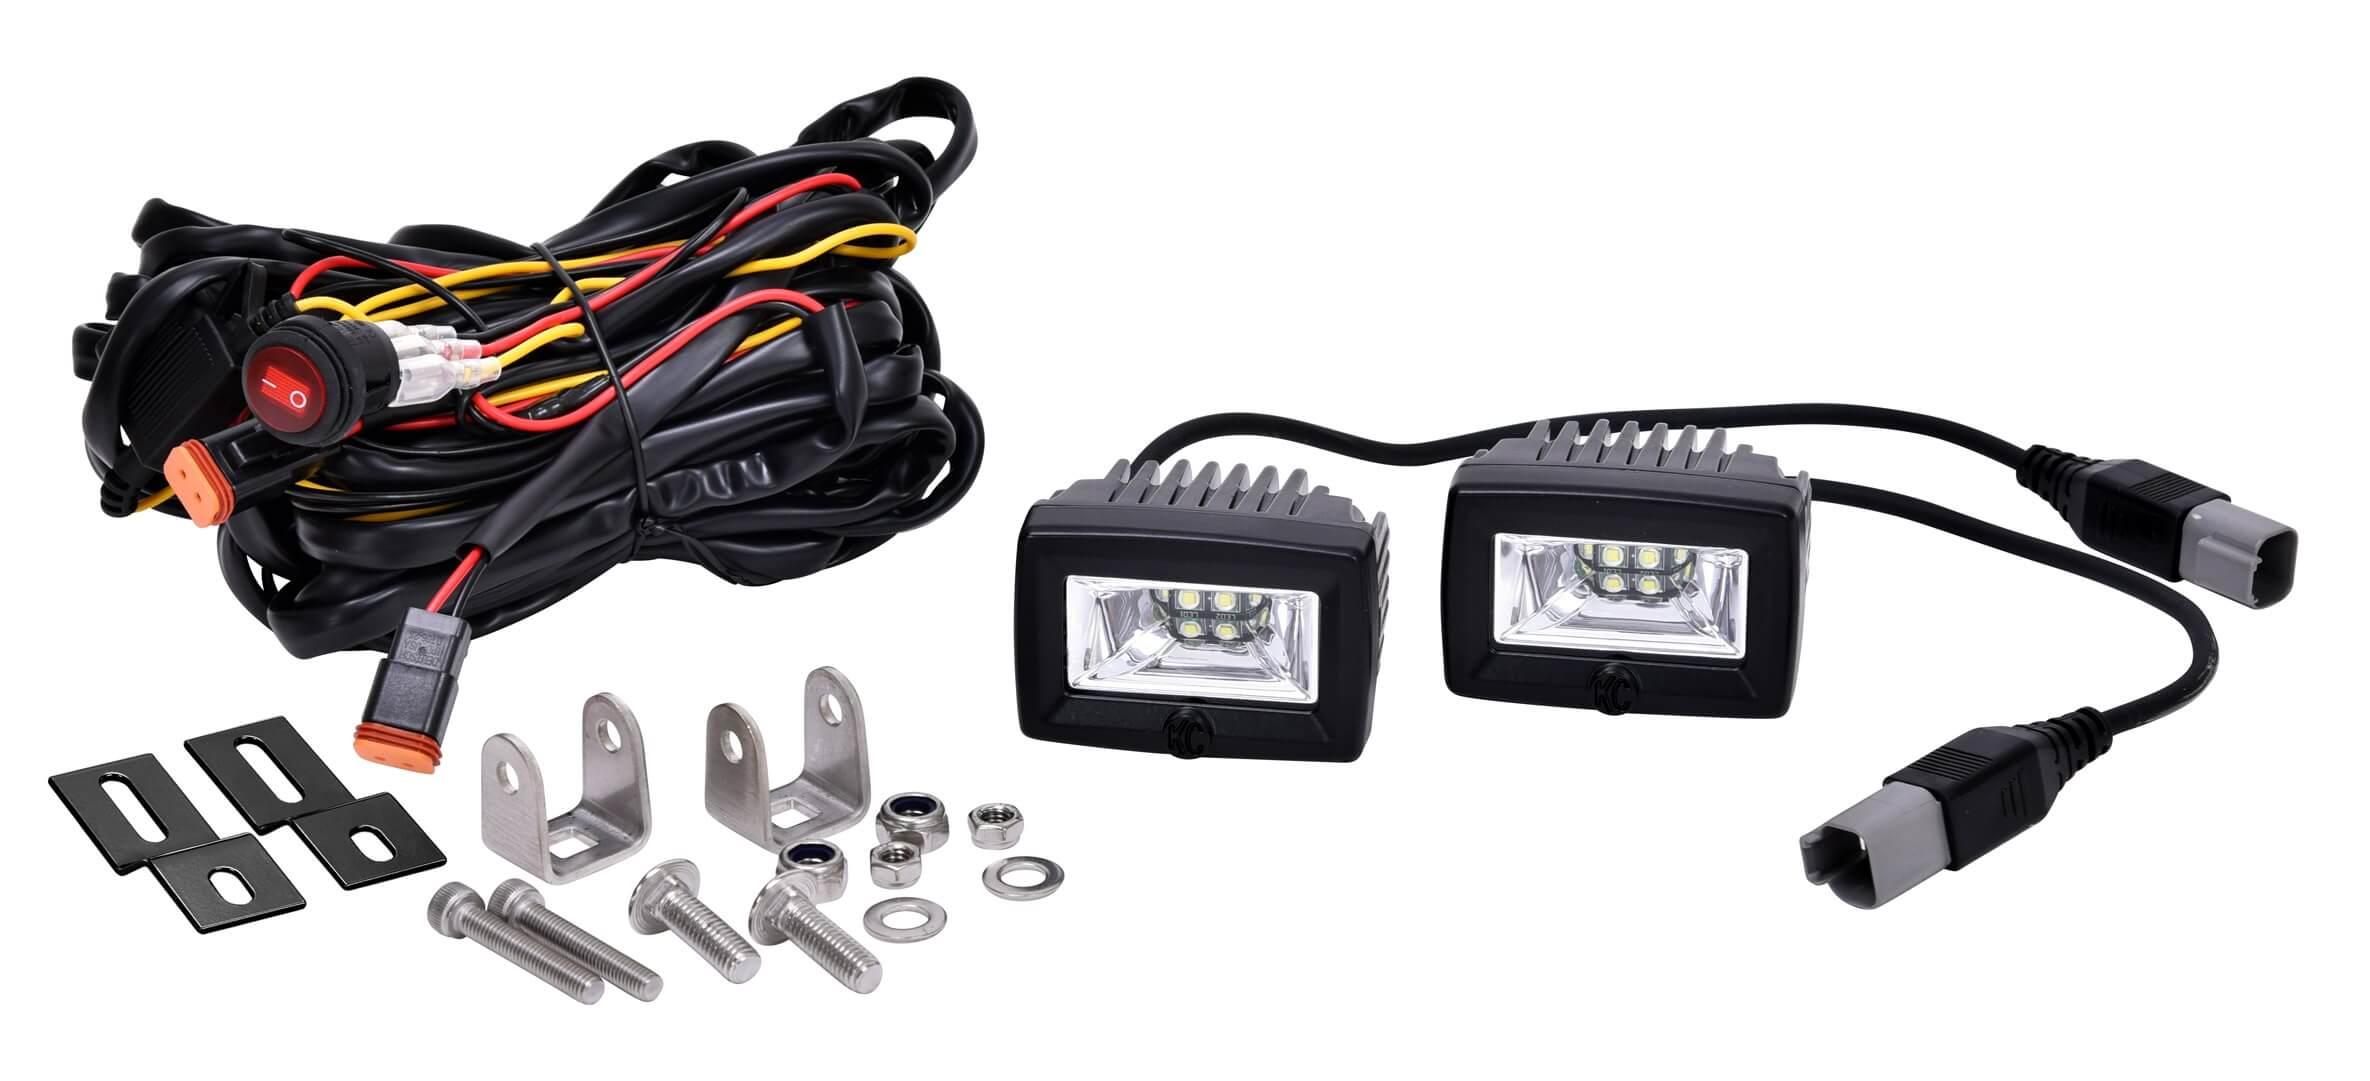 kc 2 u0026quot  c-series c2 led area flood light system -  328